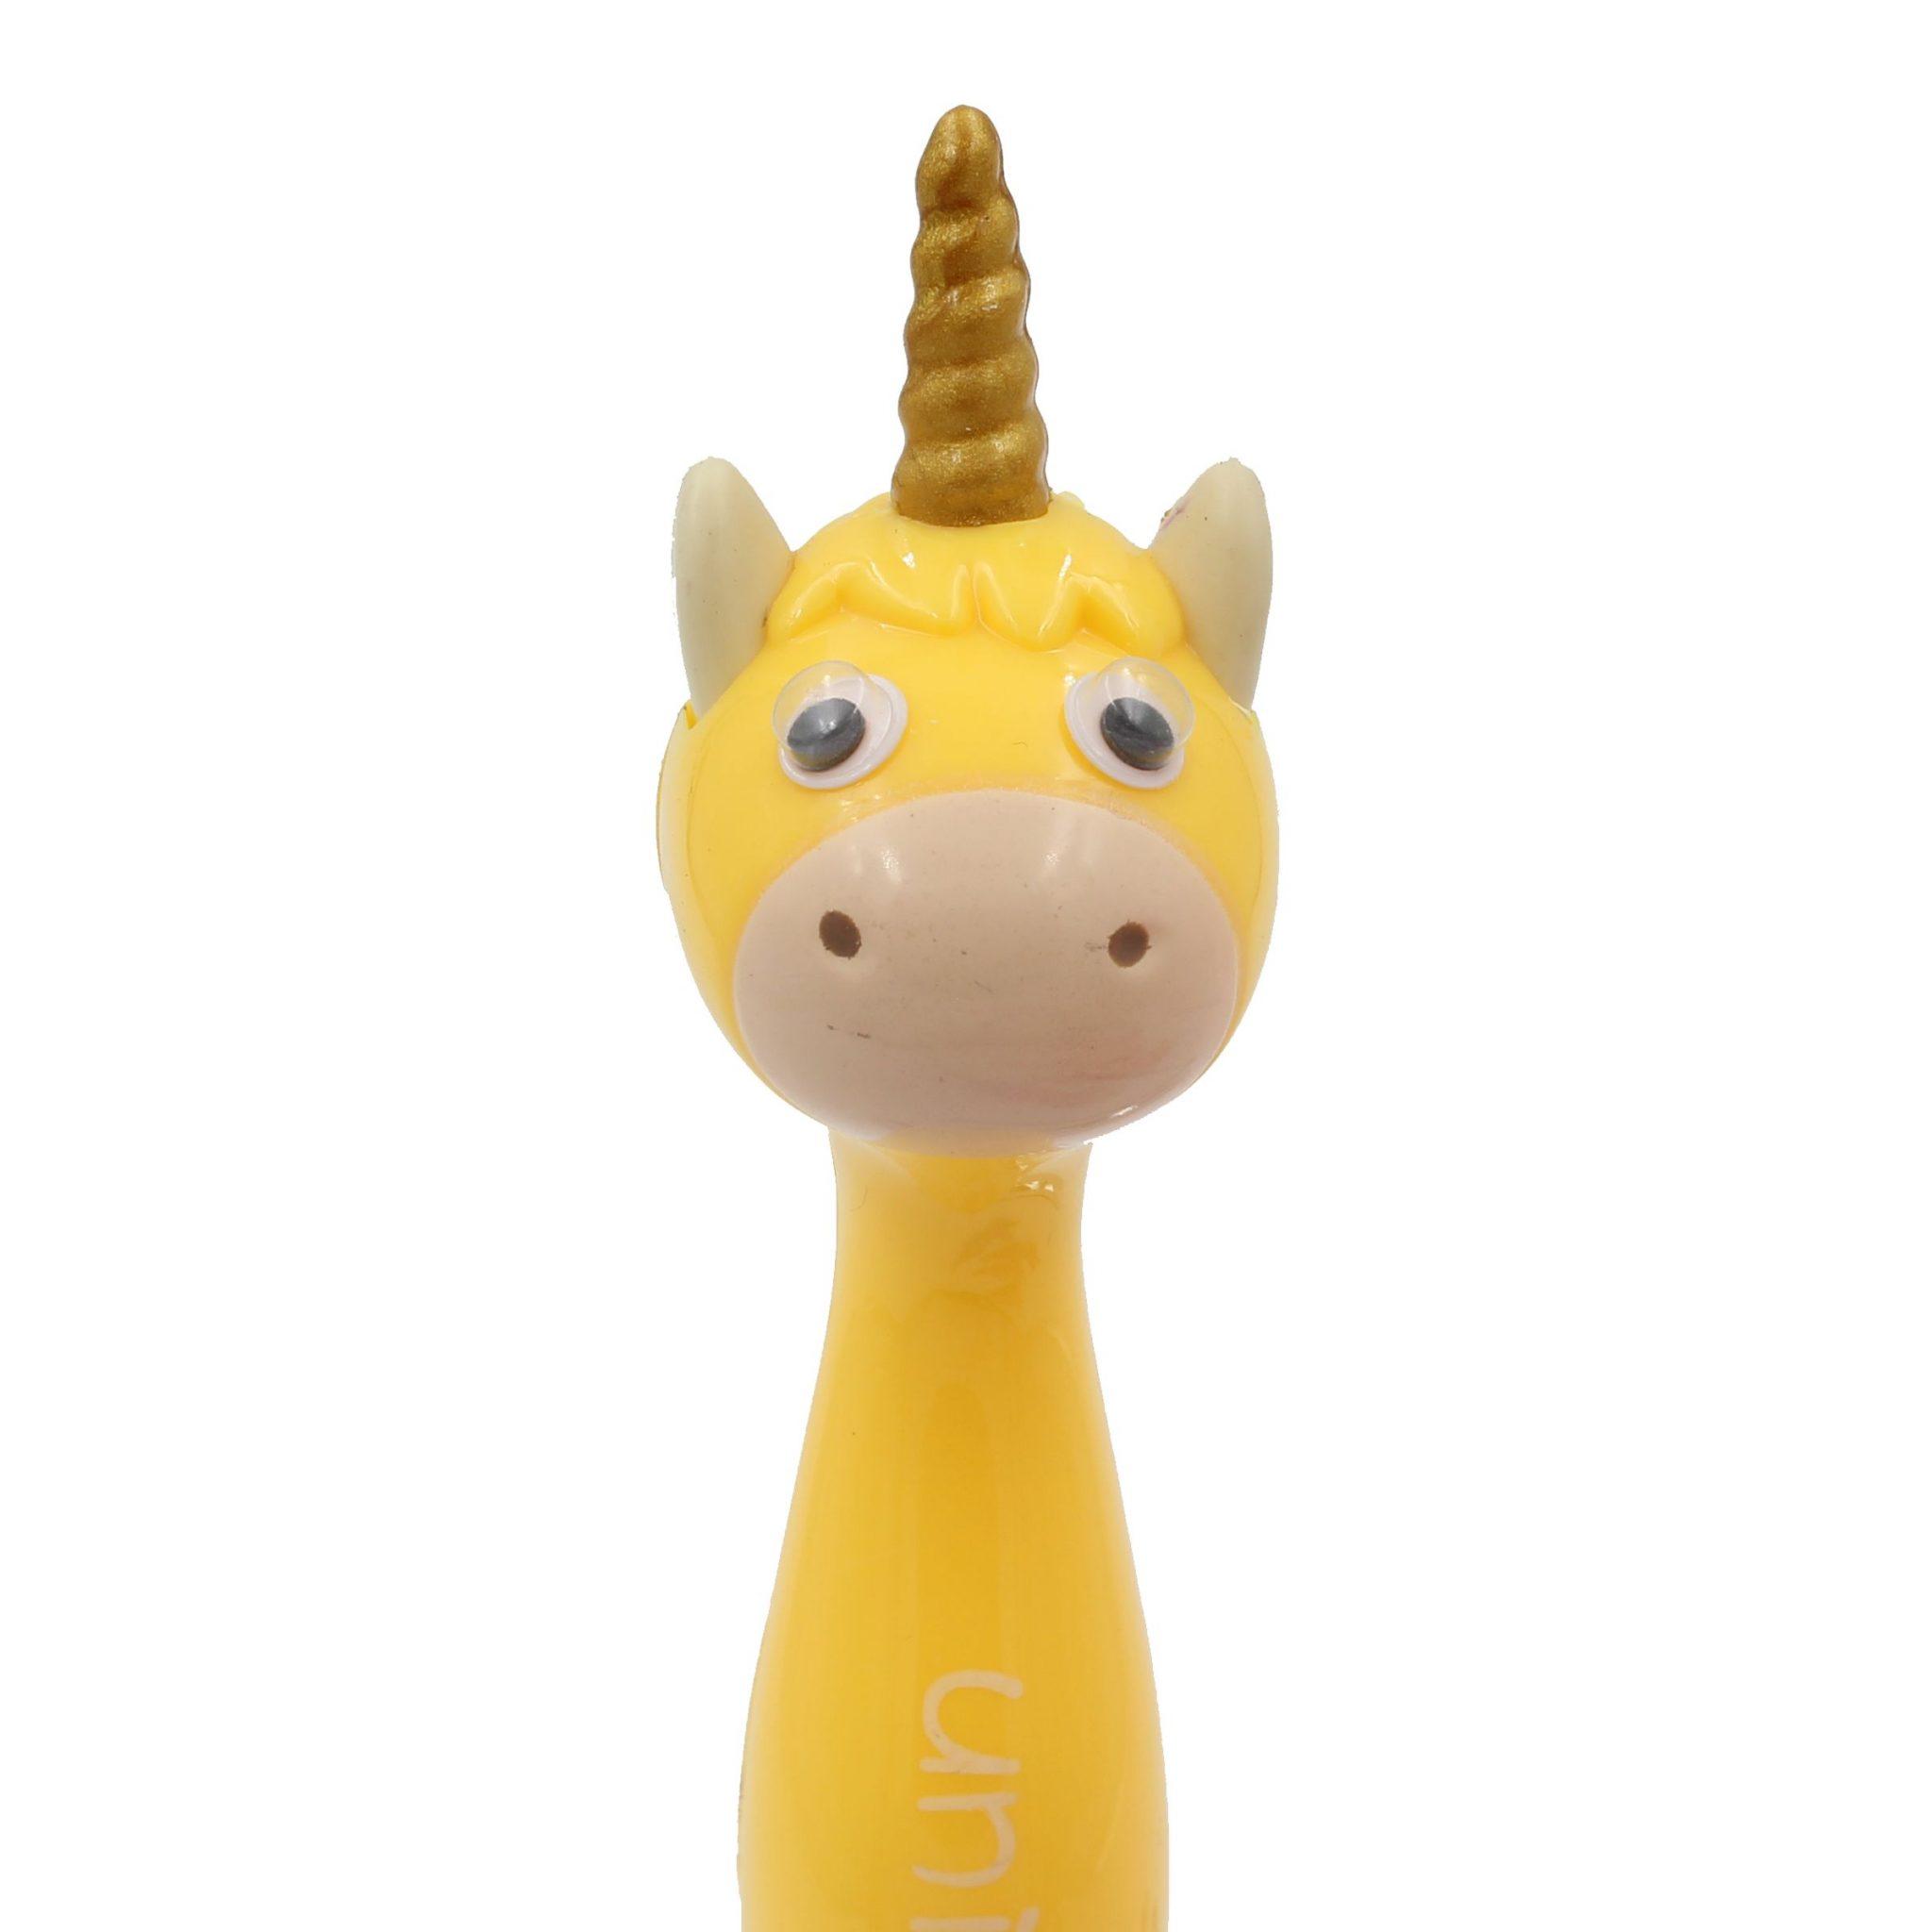 Pix funny unicorn galben colectia animalute